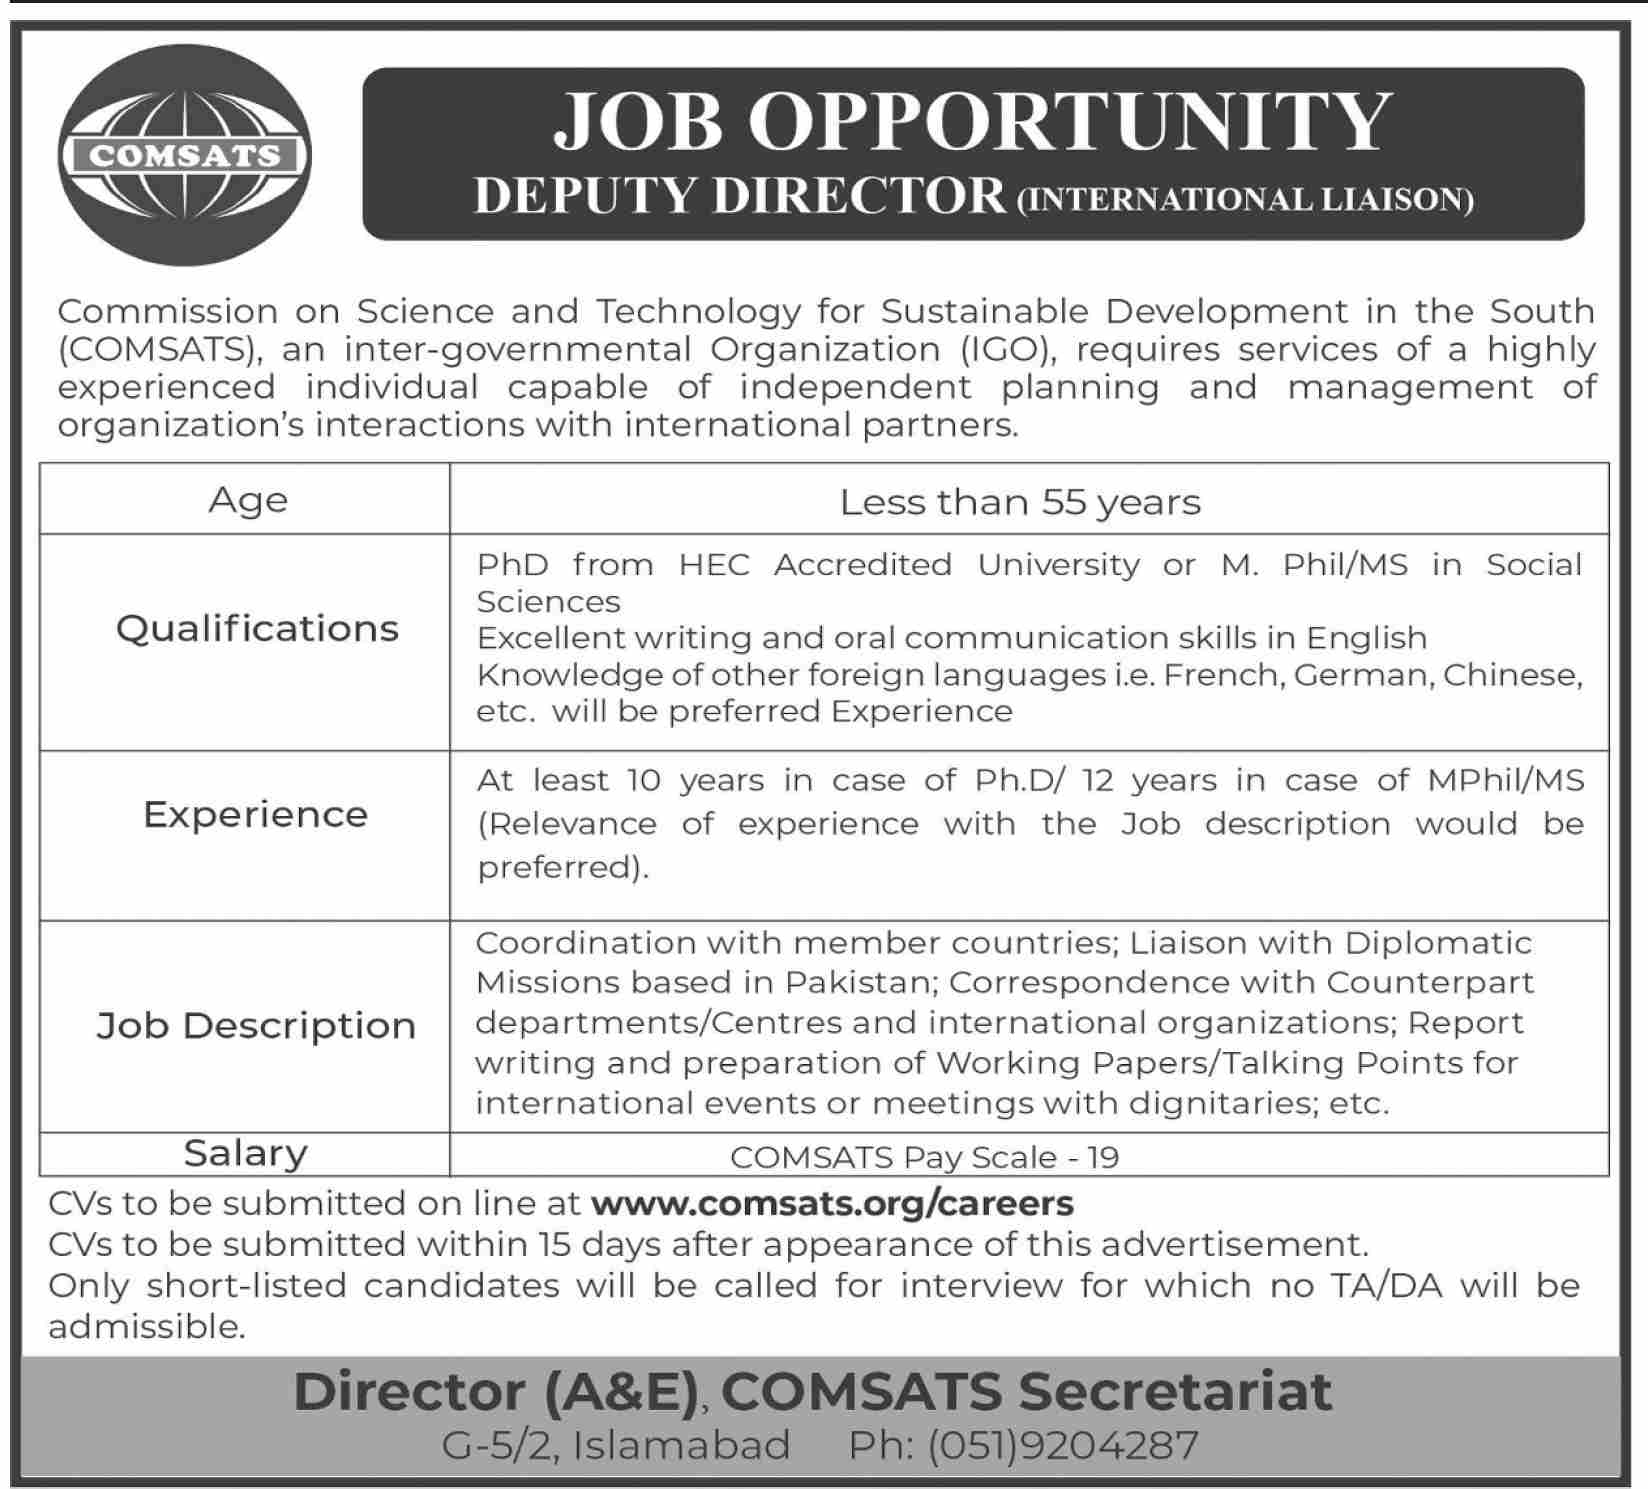 Directorate (A&E) COMSATS Secretariat Islamabad Jobs 2021 in Pakistan